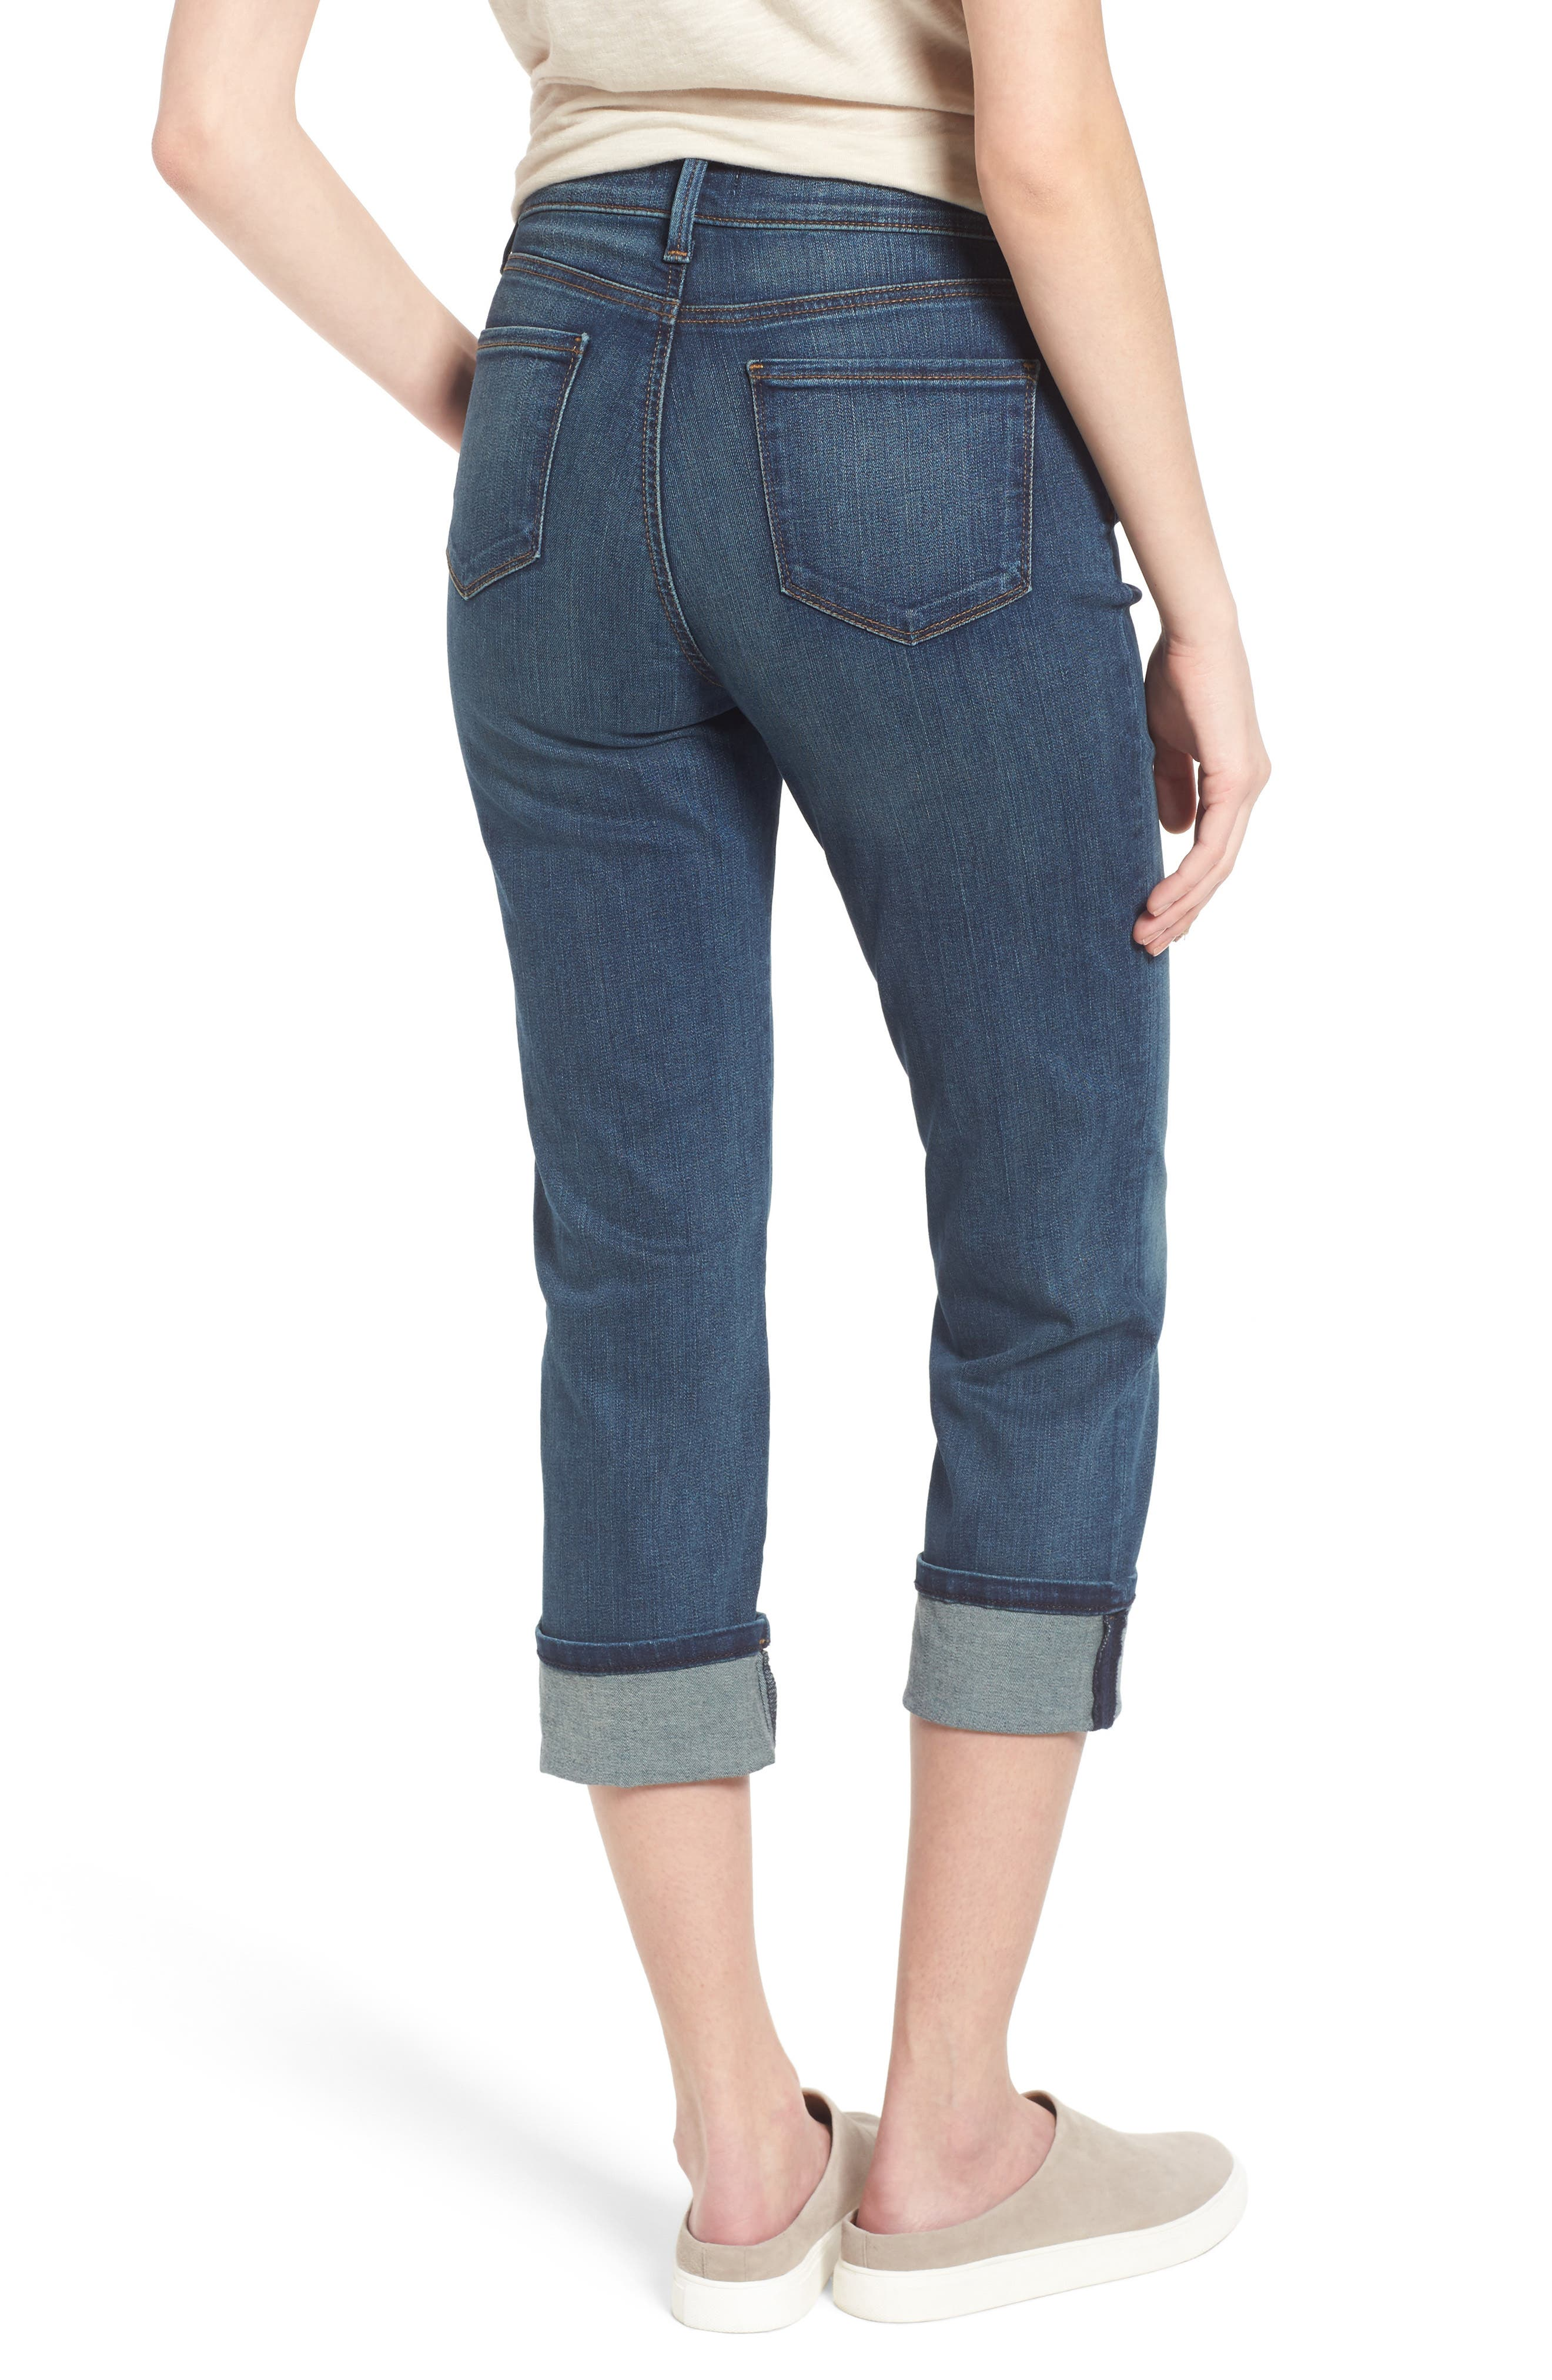 'Dayla' Colored Wide Cuff Capri Jeans,                             Alternate thumbnail 25, color,